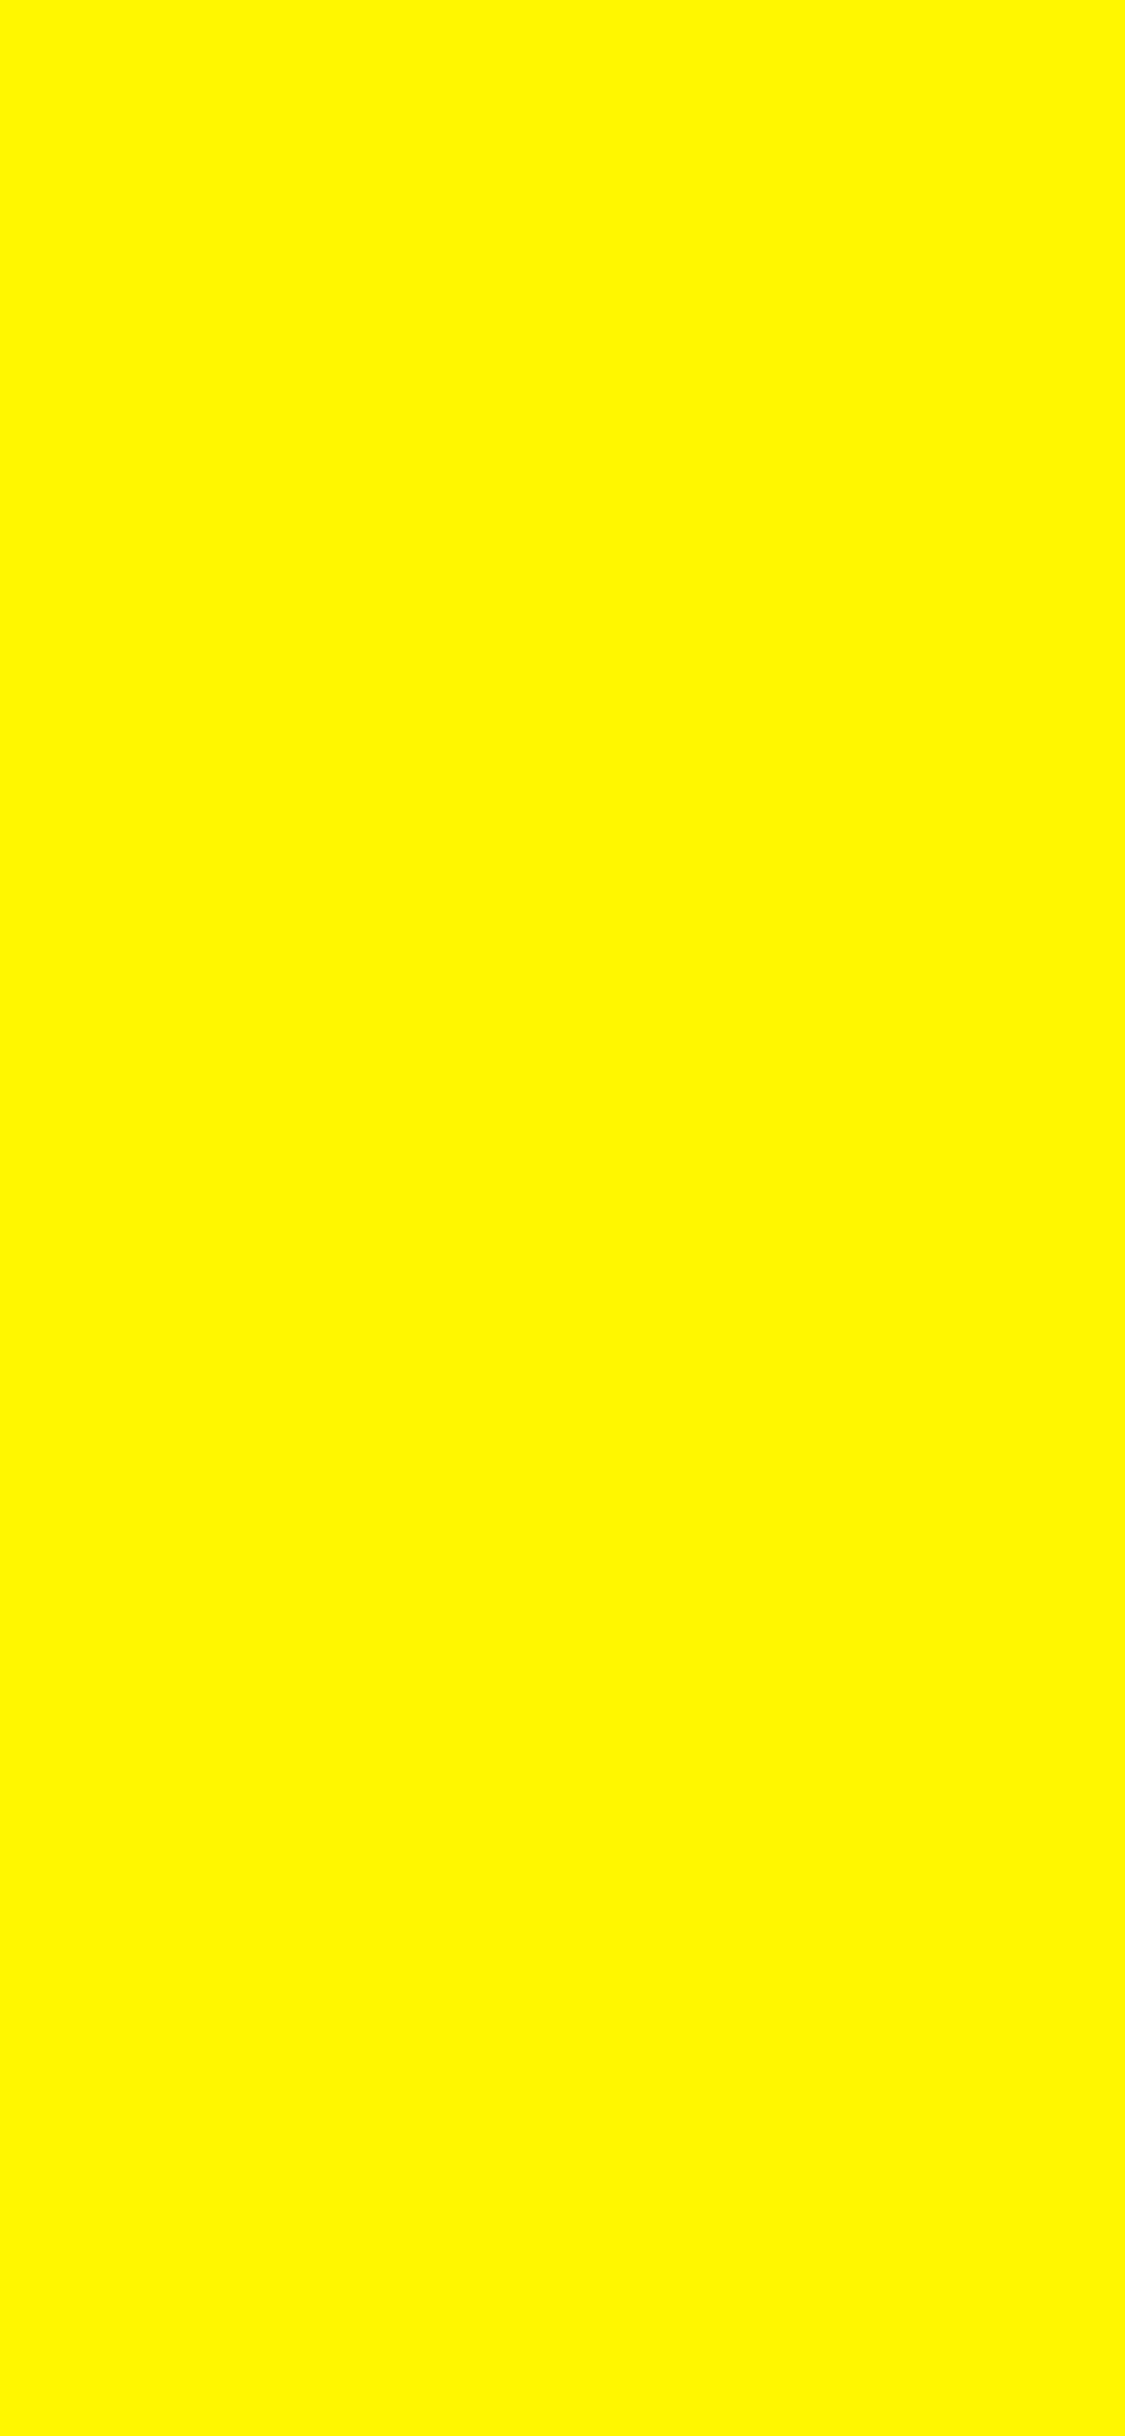 1125x2436 Lemon Solid Color Background